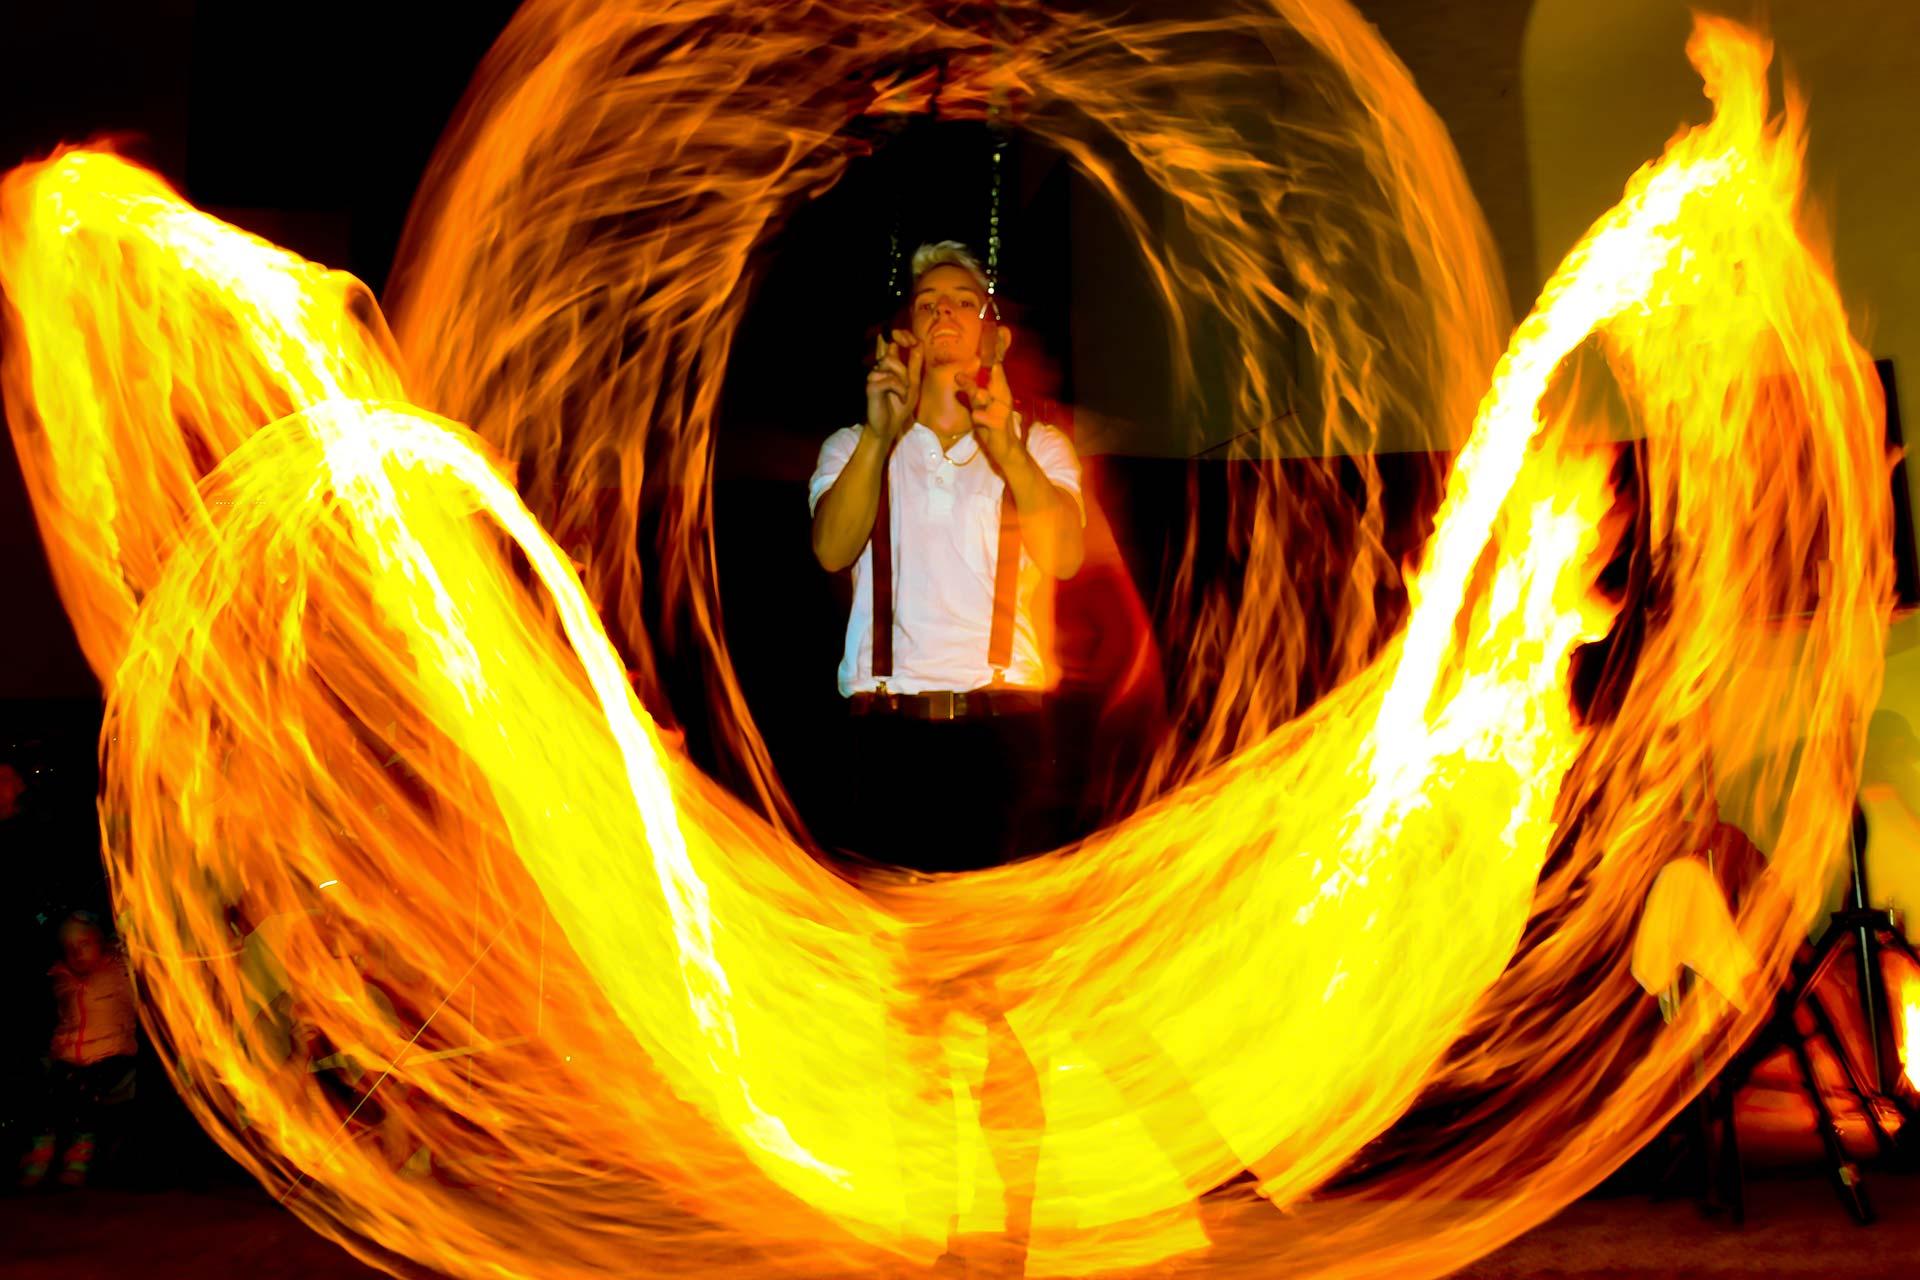 Light Painting - Feuerspiel